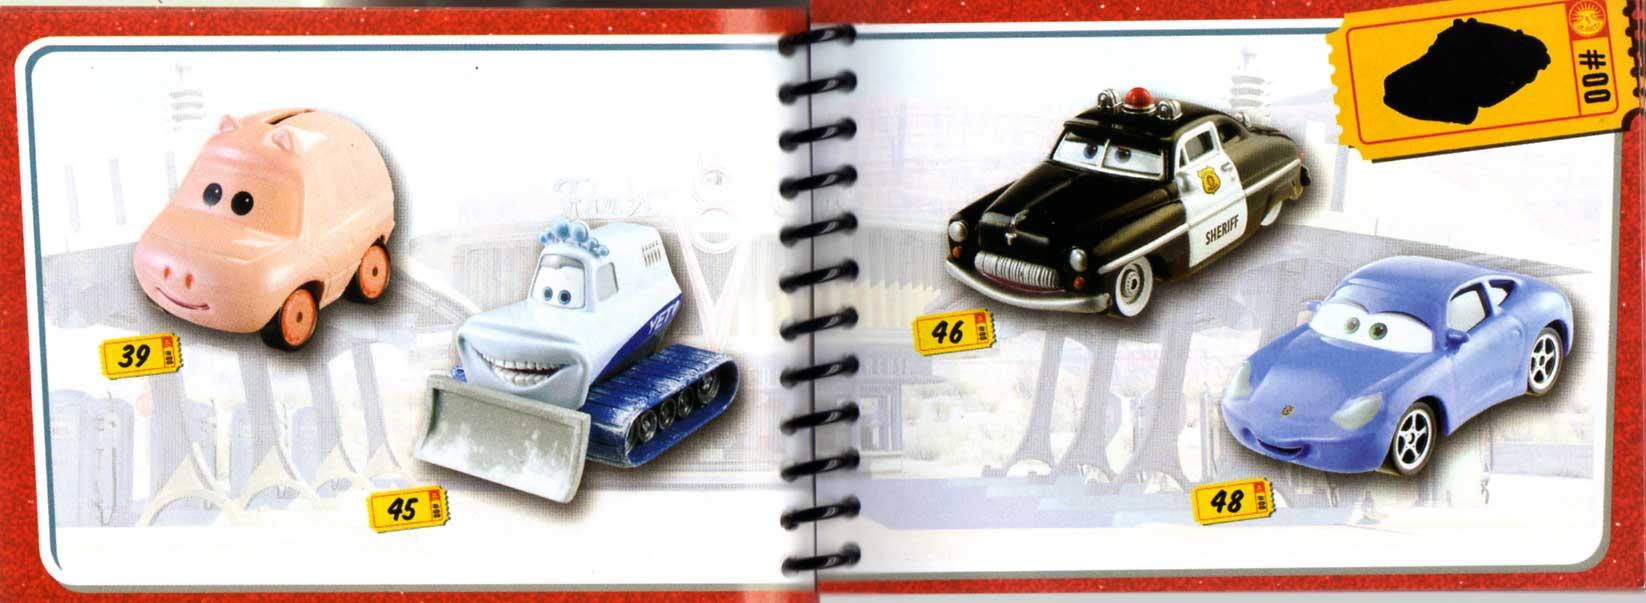 Catalogue Race O Rama page 14 - 15